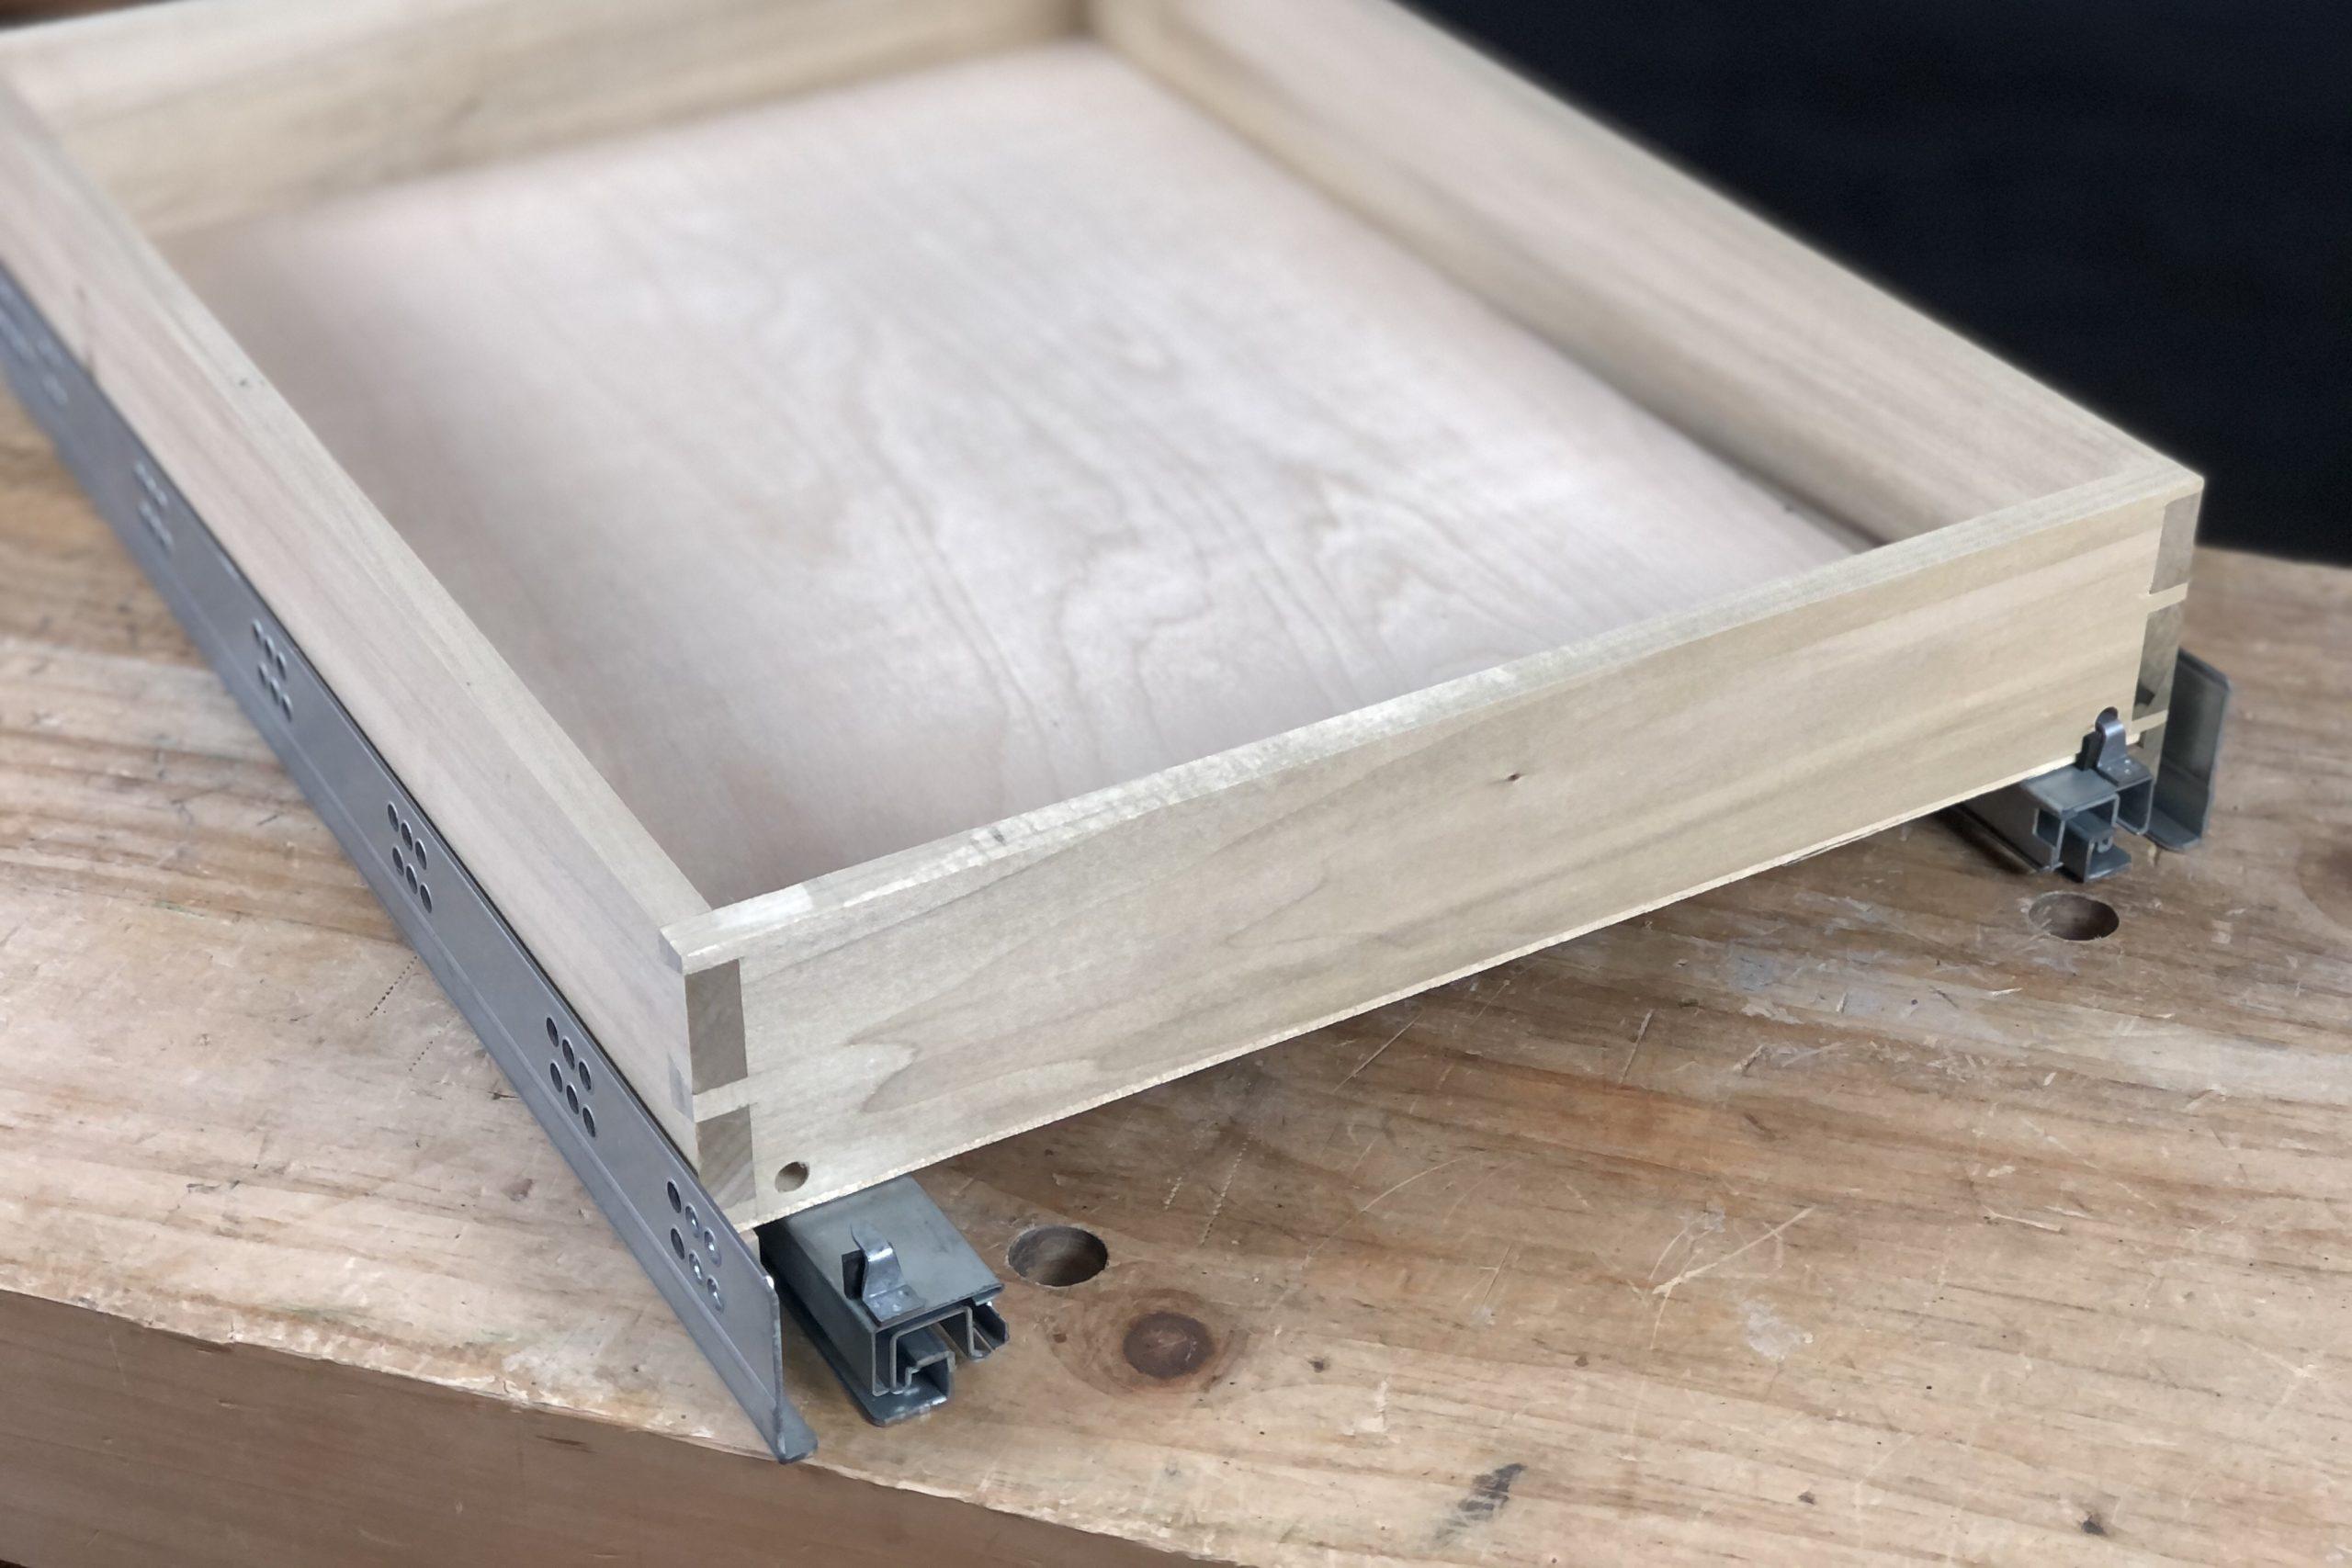 Installing Concealed Soft Close Undermount Drawer Slides